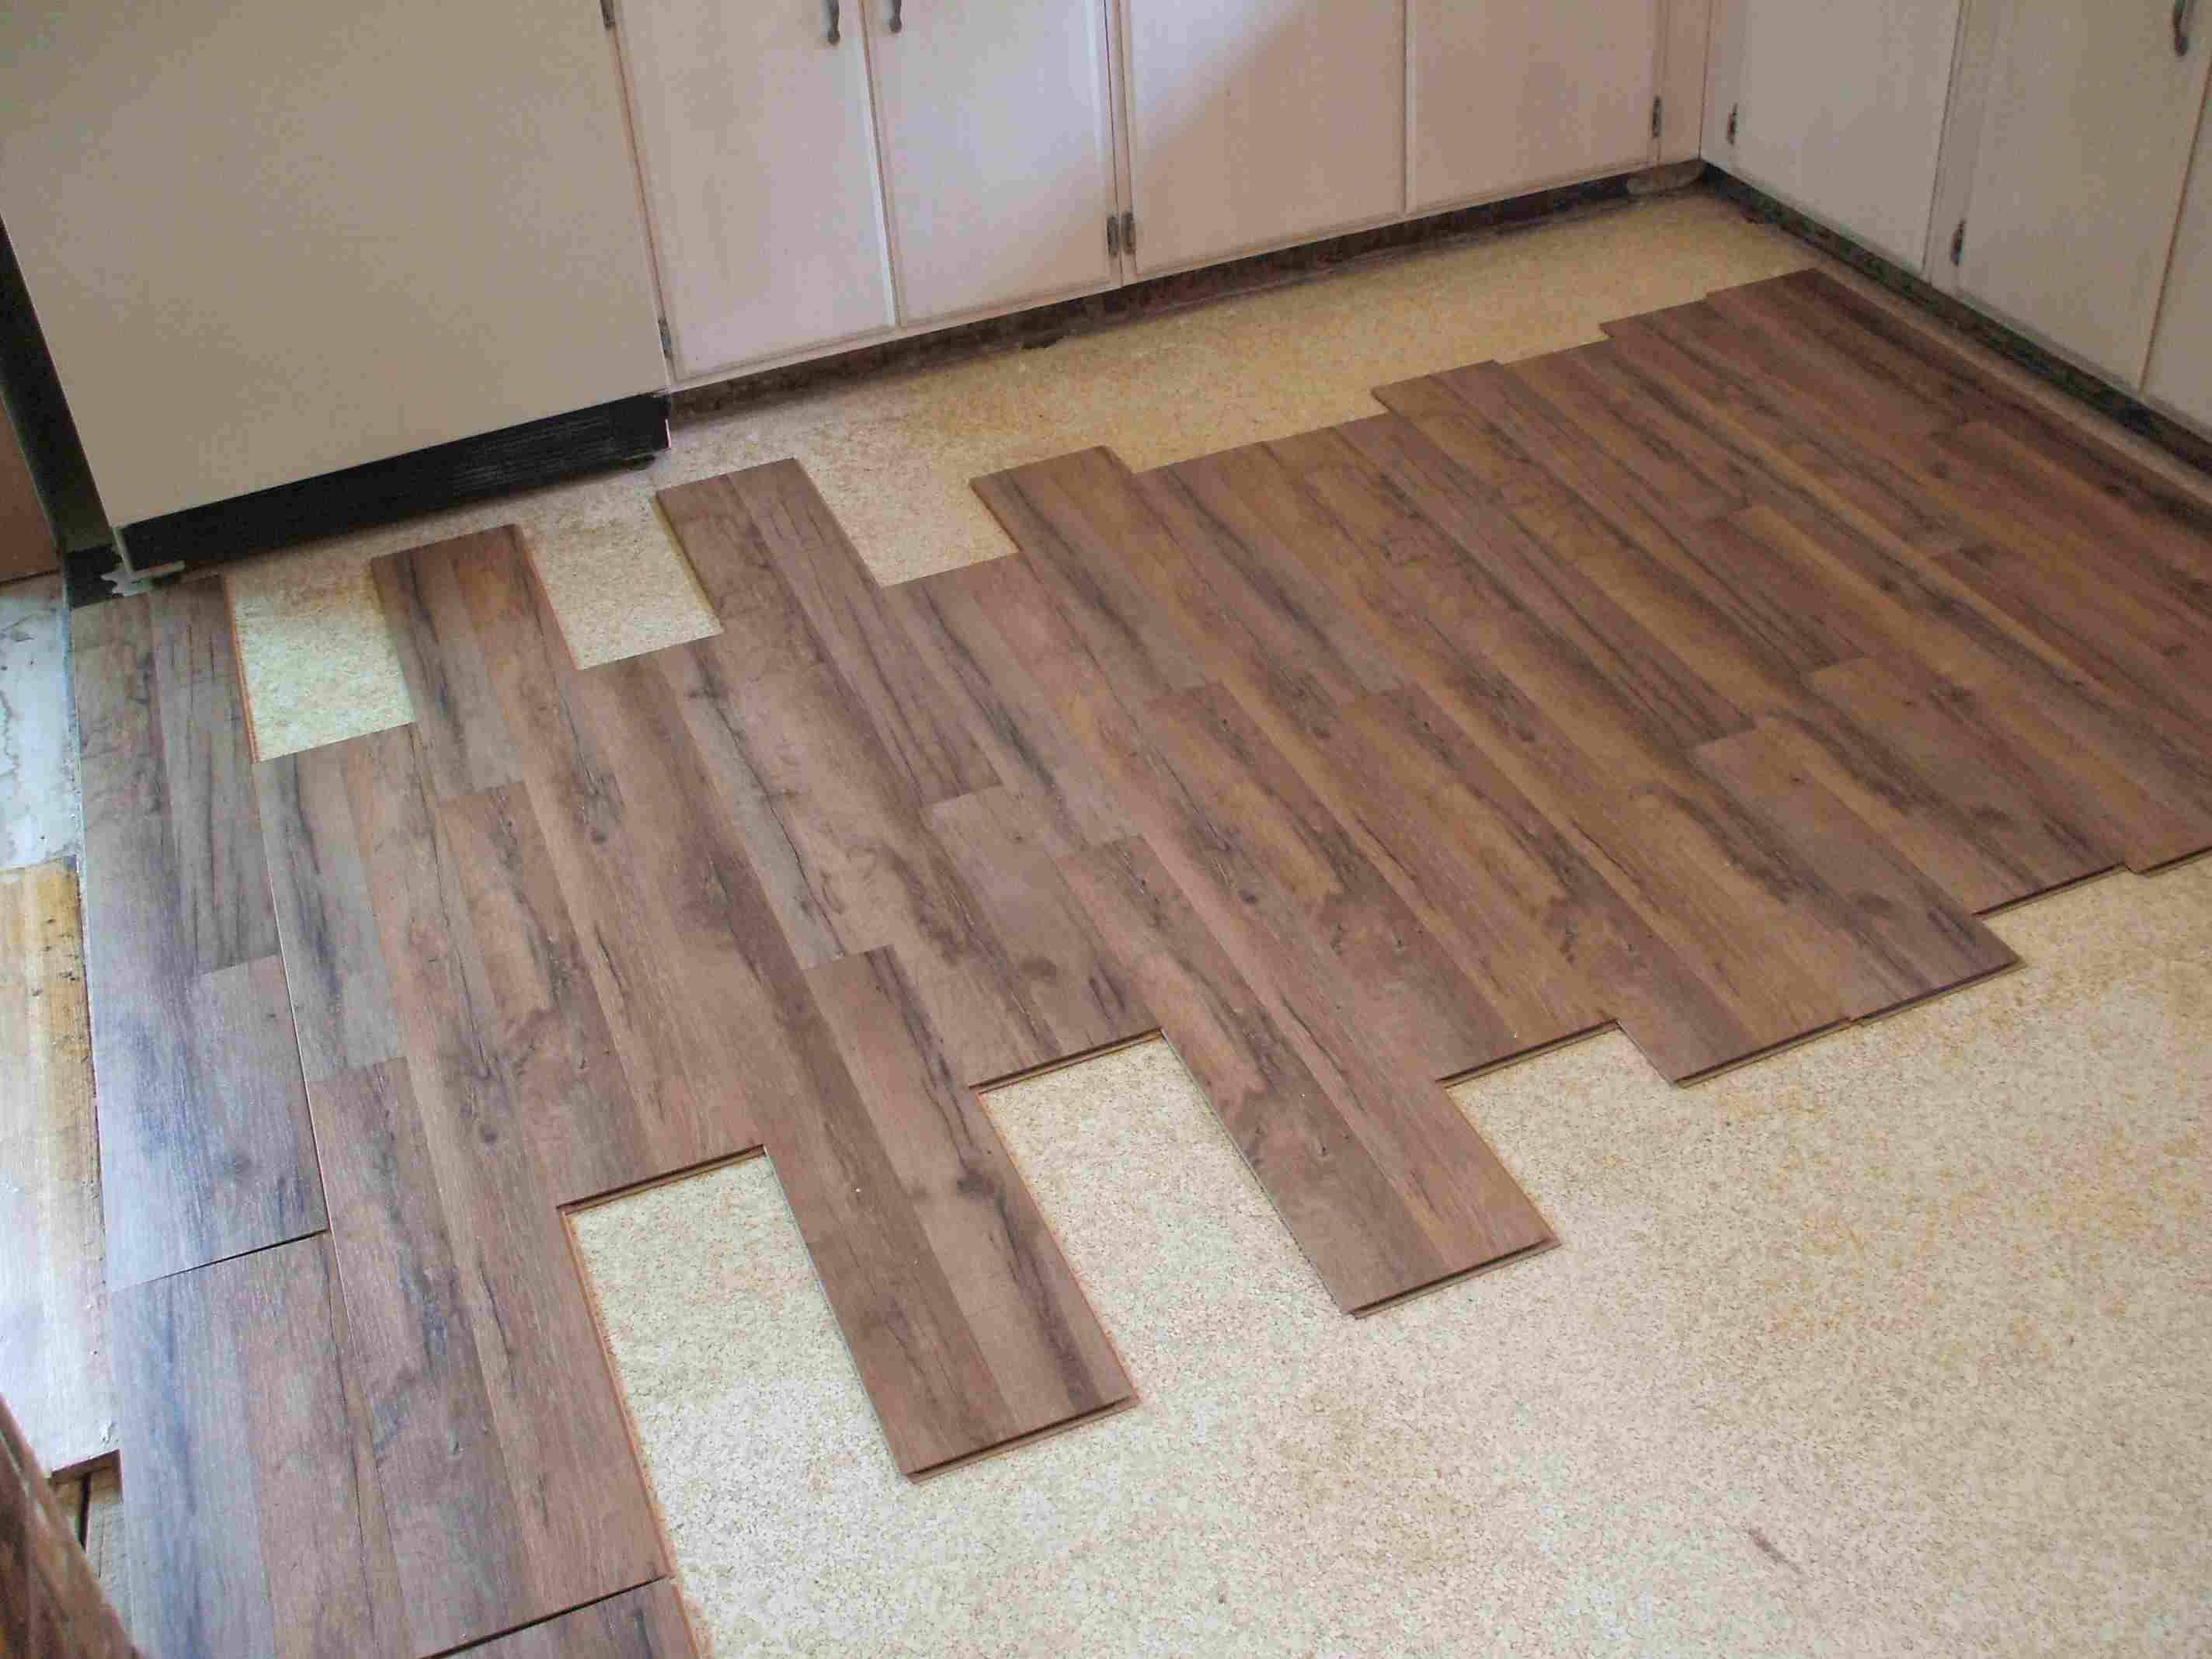 hardwood floor underlayment types of laminate flooring installation made easy pertaining to installing laminate eyeballing layout 56a49d075f9b58b7d0d7d693 jpg